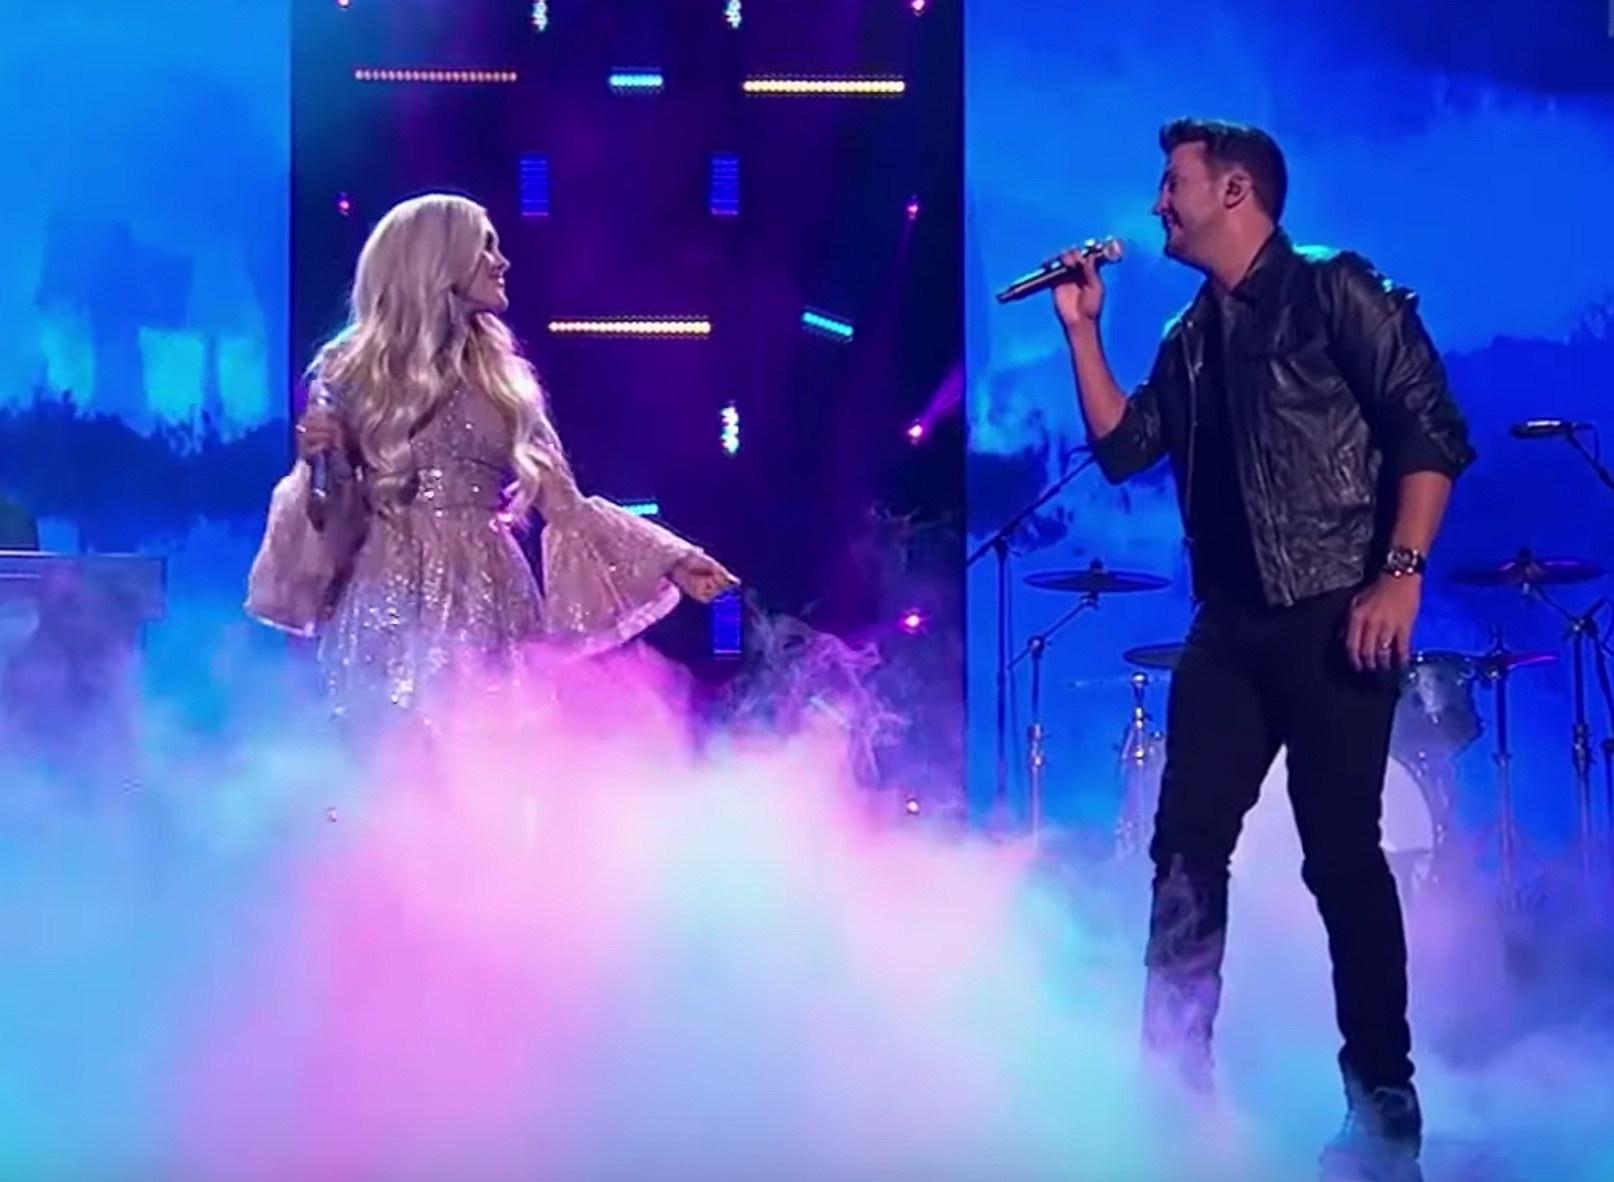 WATCH: Luke Bryan, Laci Kaye Booth Duet 'Every Breath You Take' on 'American Idol'